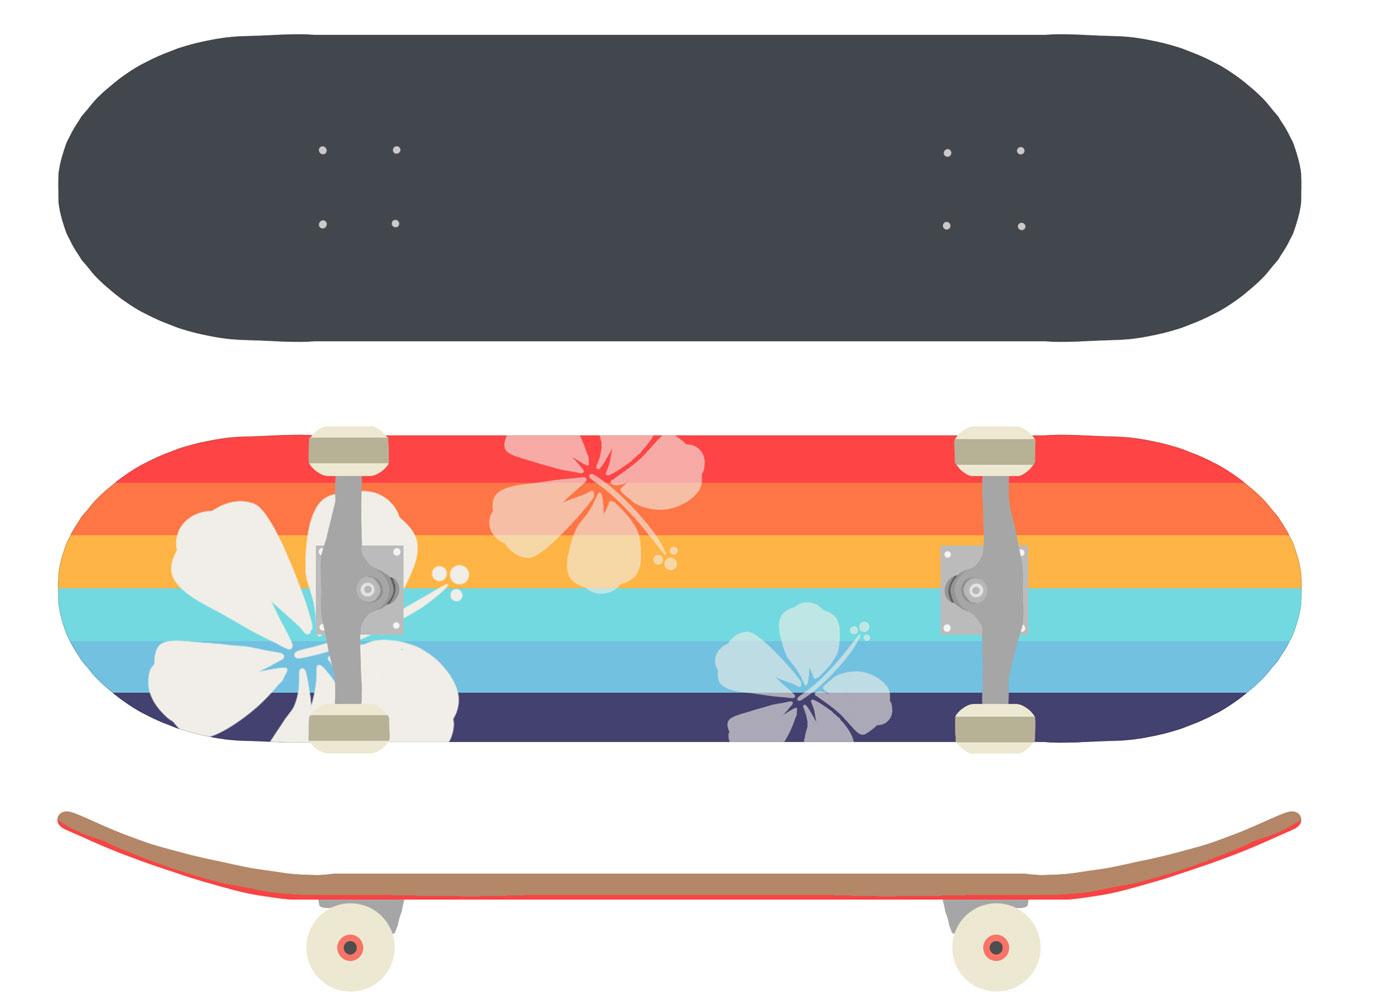 prop-skateboard.jpg